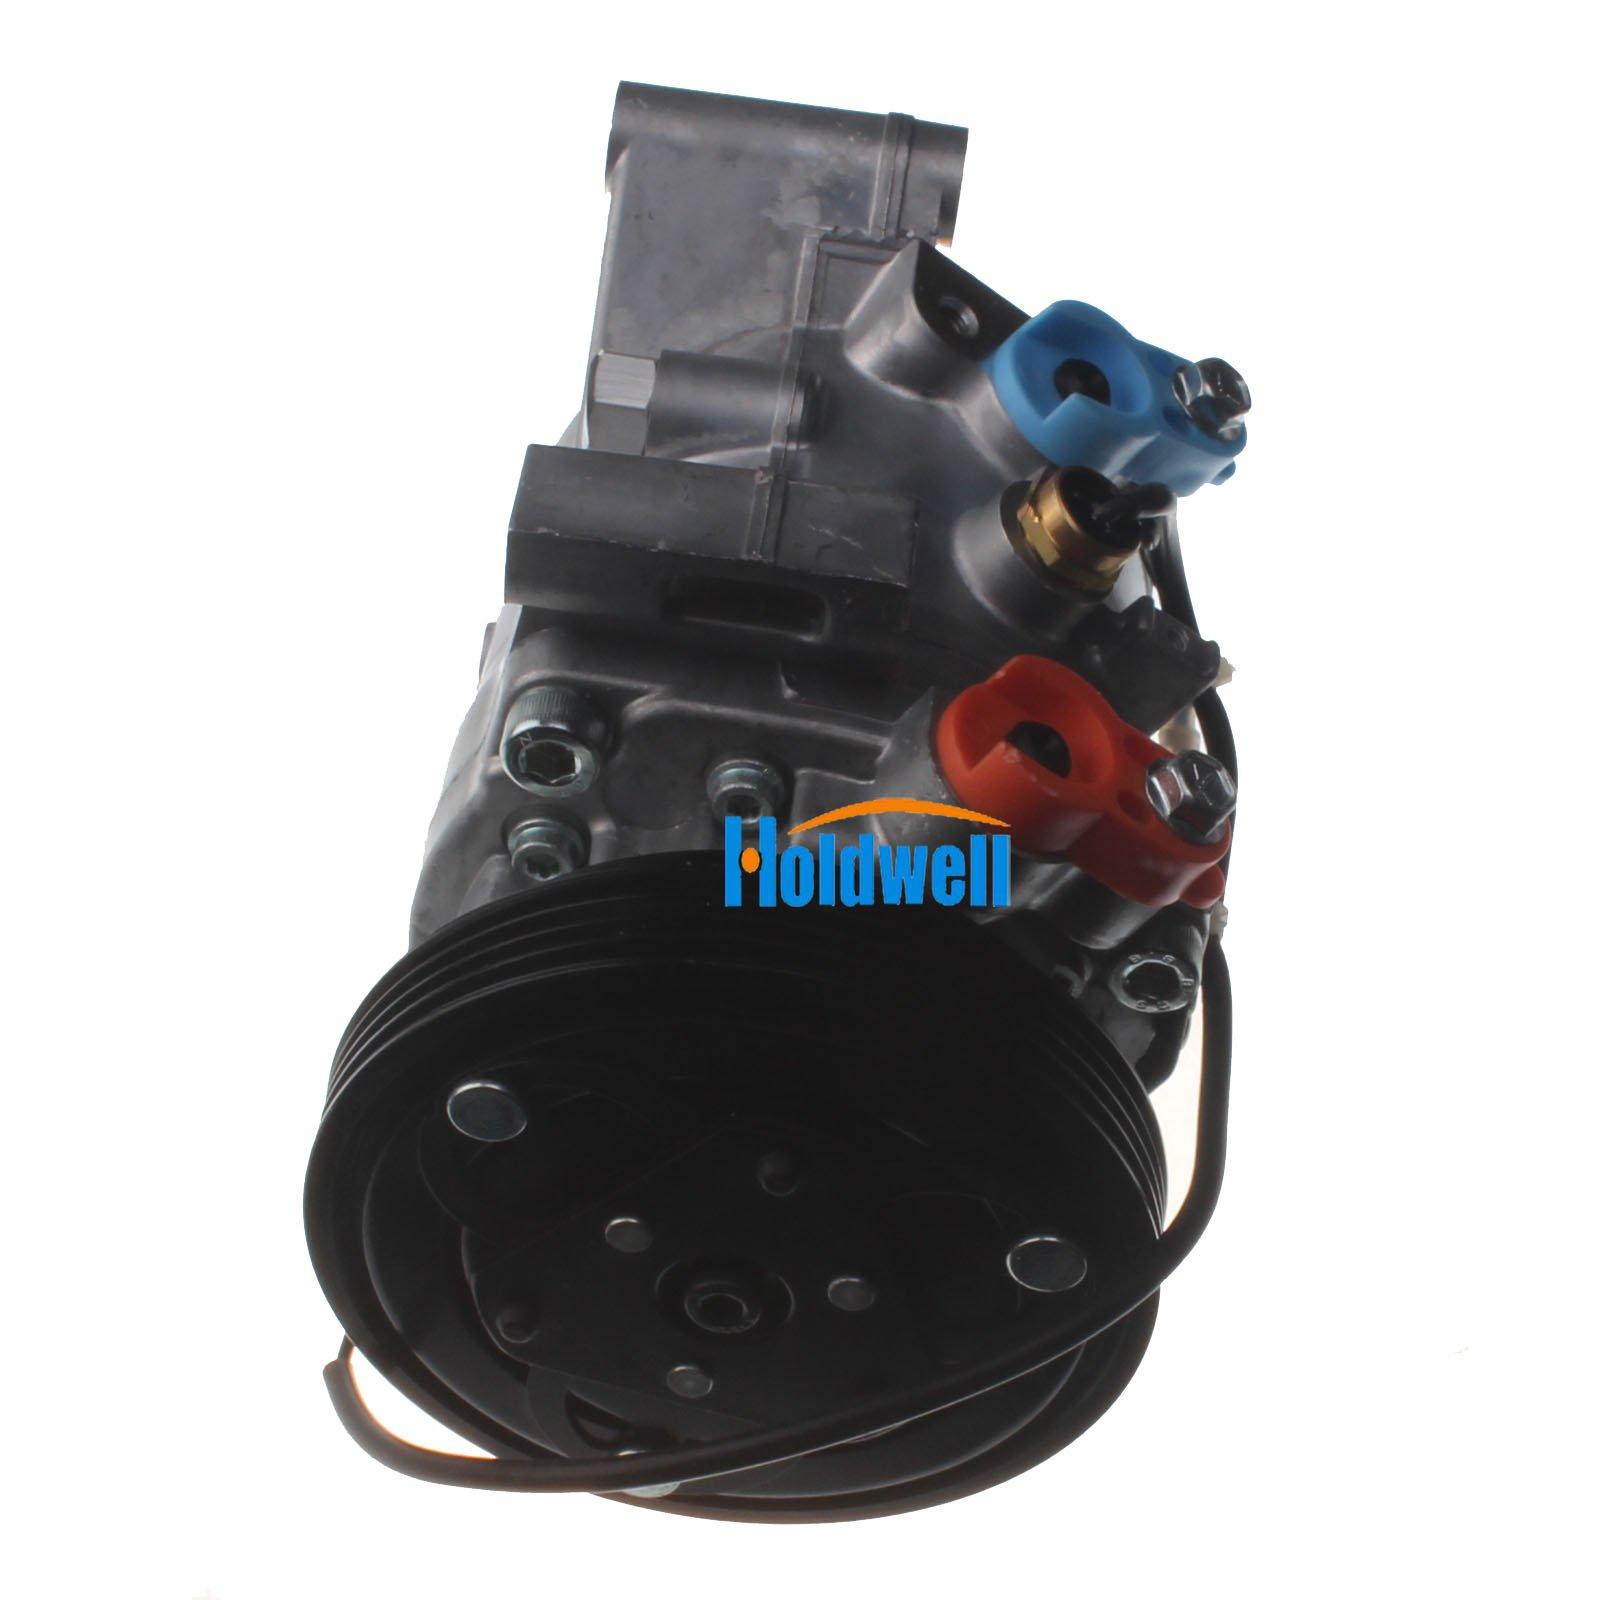 Holdwell Auto AC Compressor 95201-77GB2 9520177GB2 for Suzuki Jimny Seiko Seiki SS07LK10 by Holdwell (Image #4)